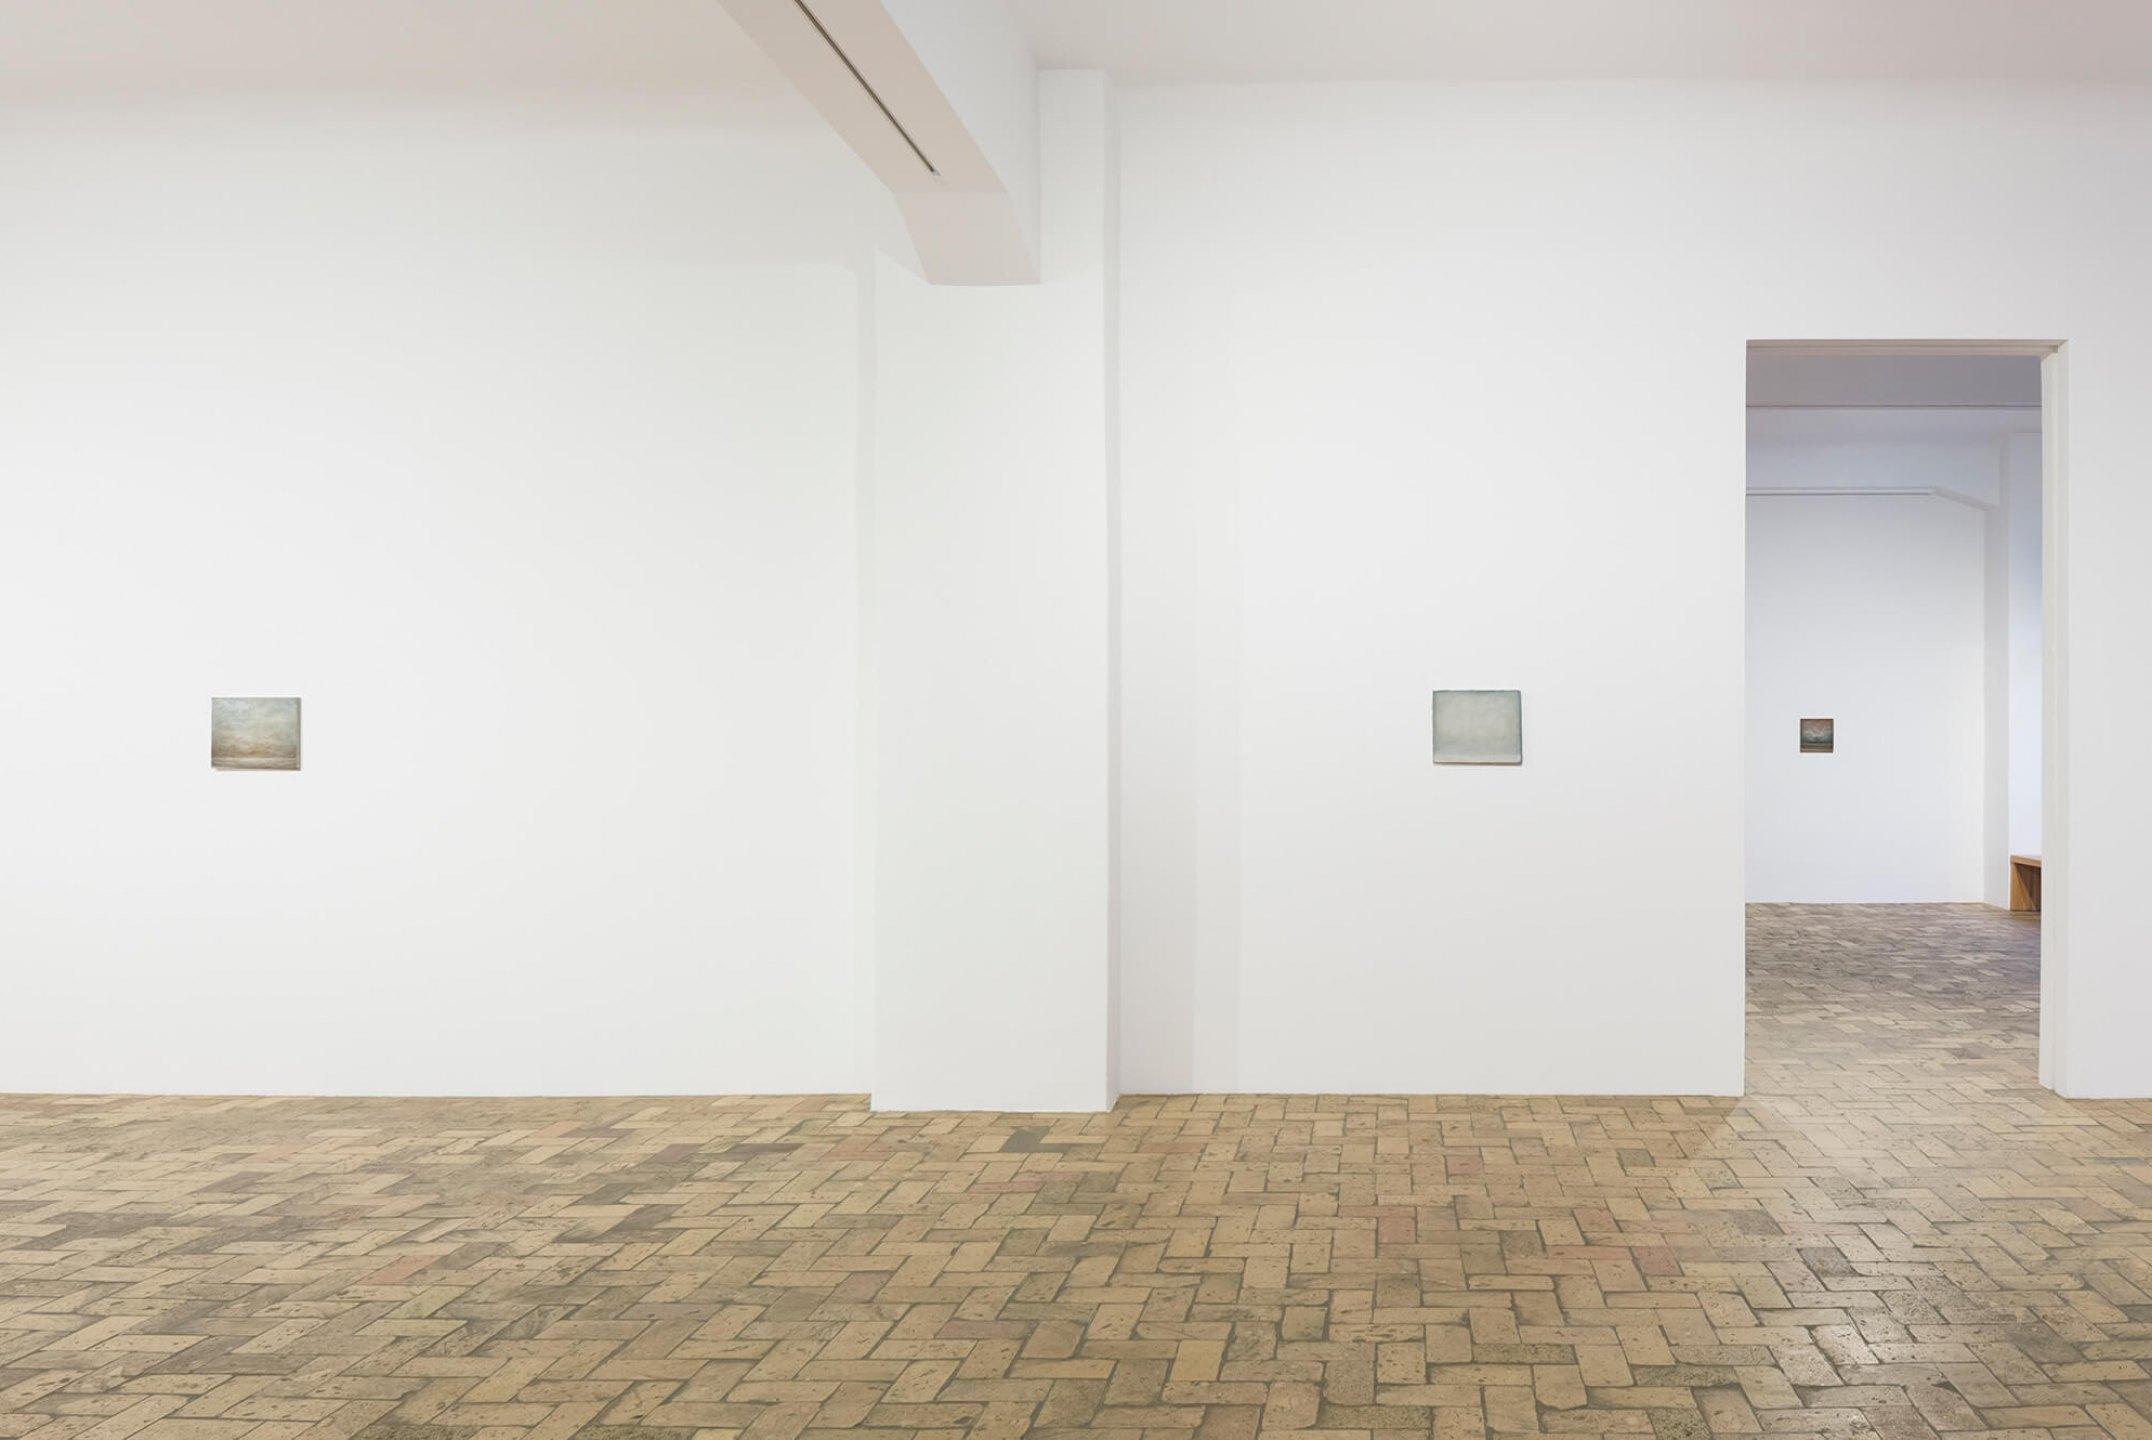 Lucas Arruda,&nbsp;<em>Deserto-Modelo</em>, 2015, VeneKlasen Werner,&nbsp;Berlin - Mendes Wood DM